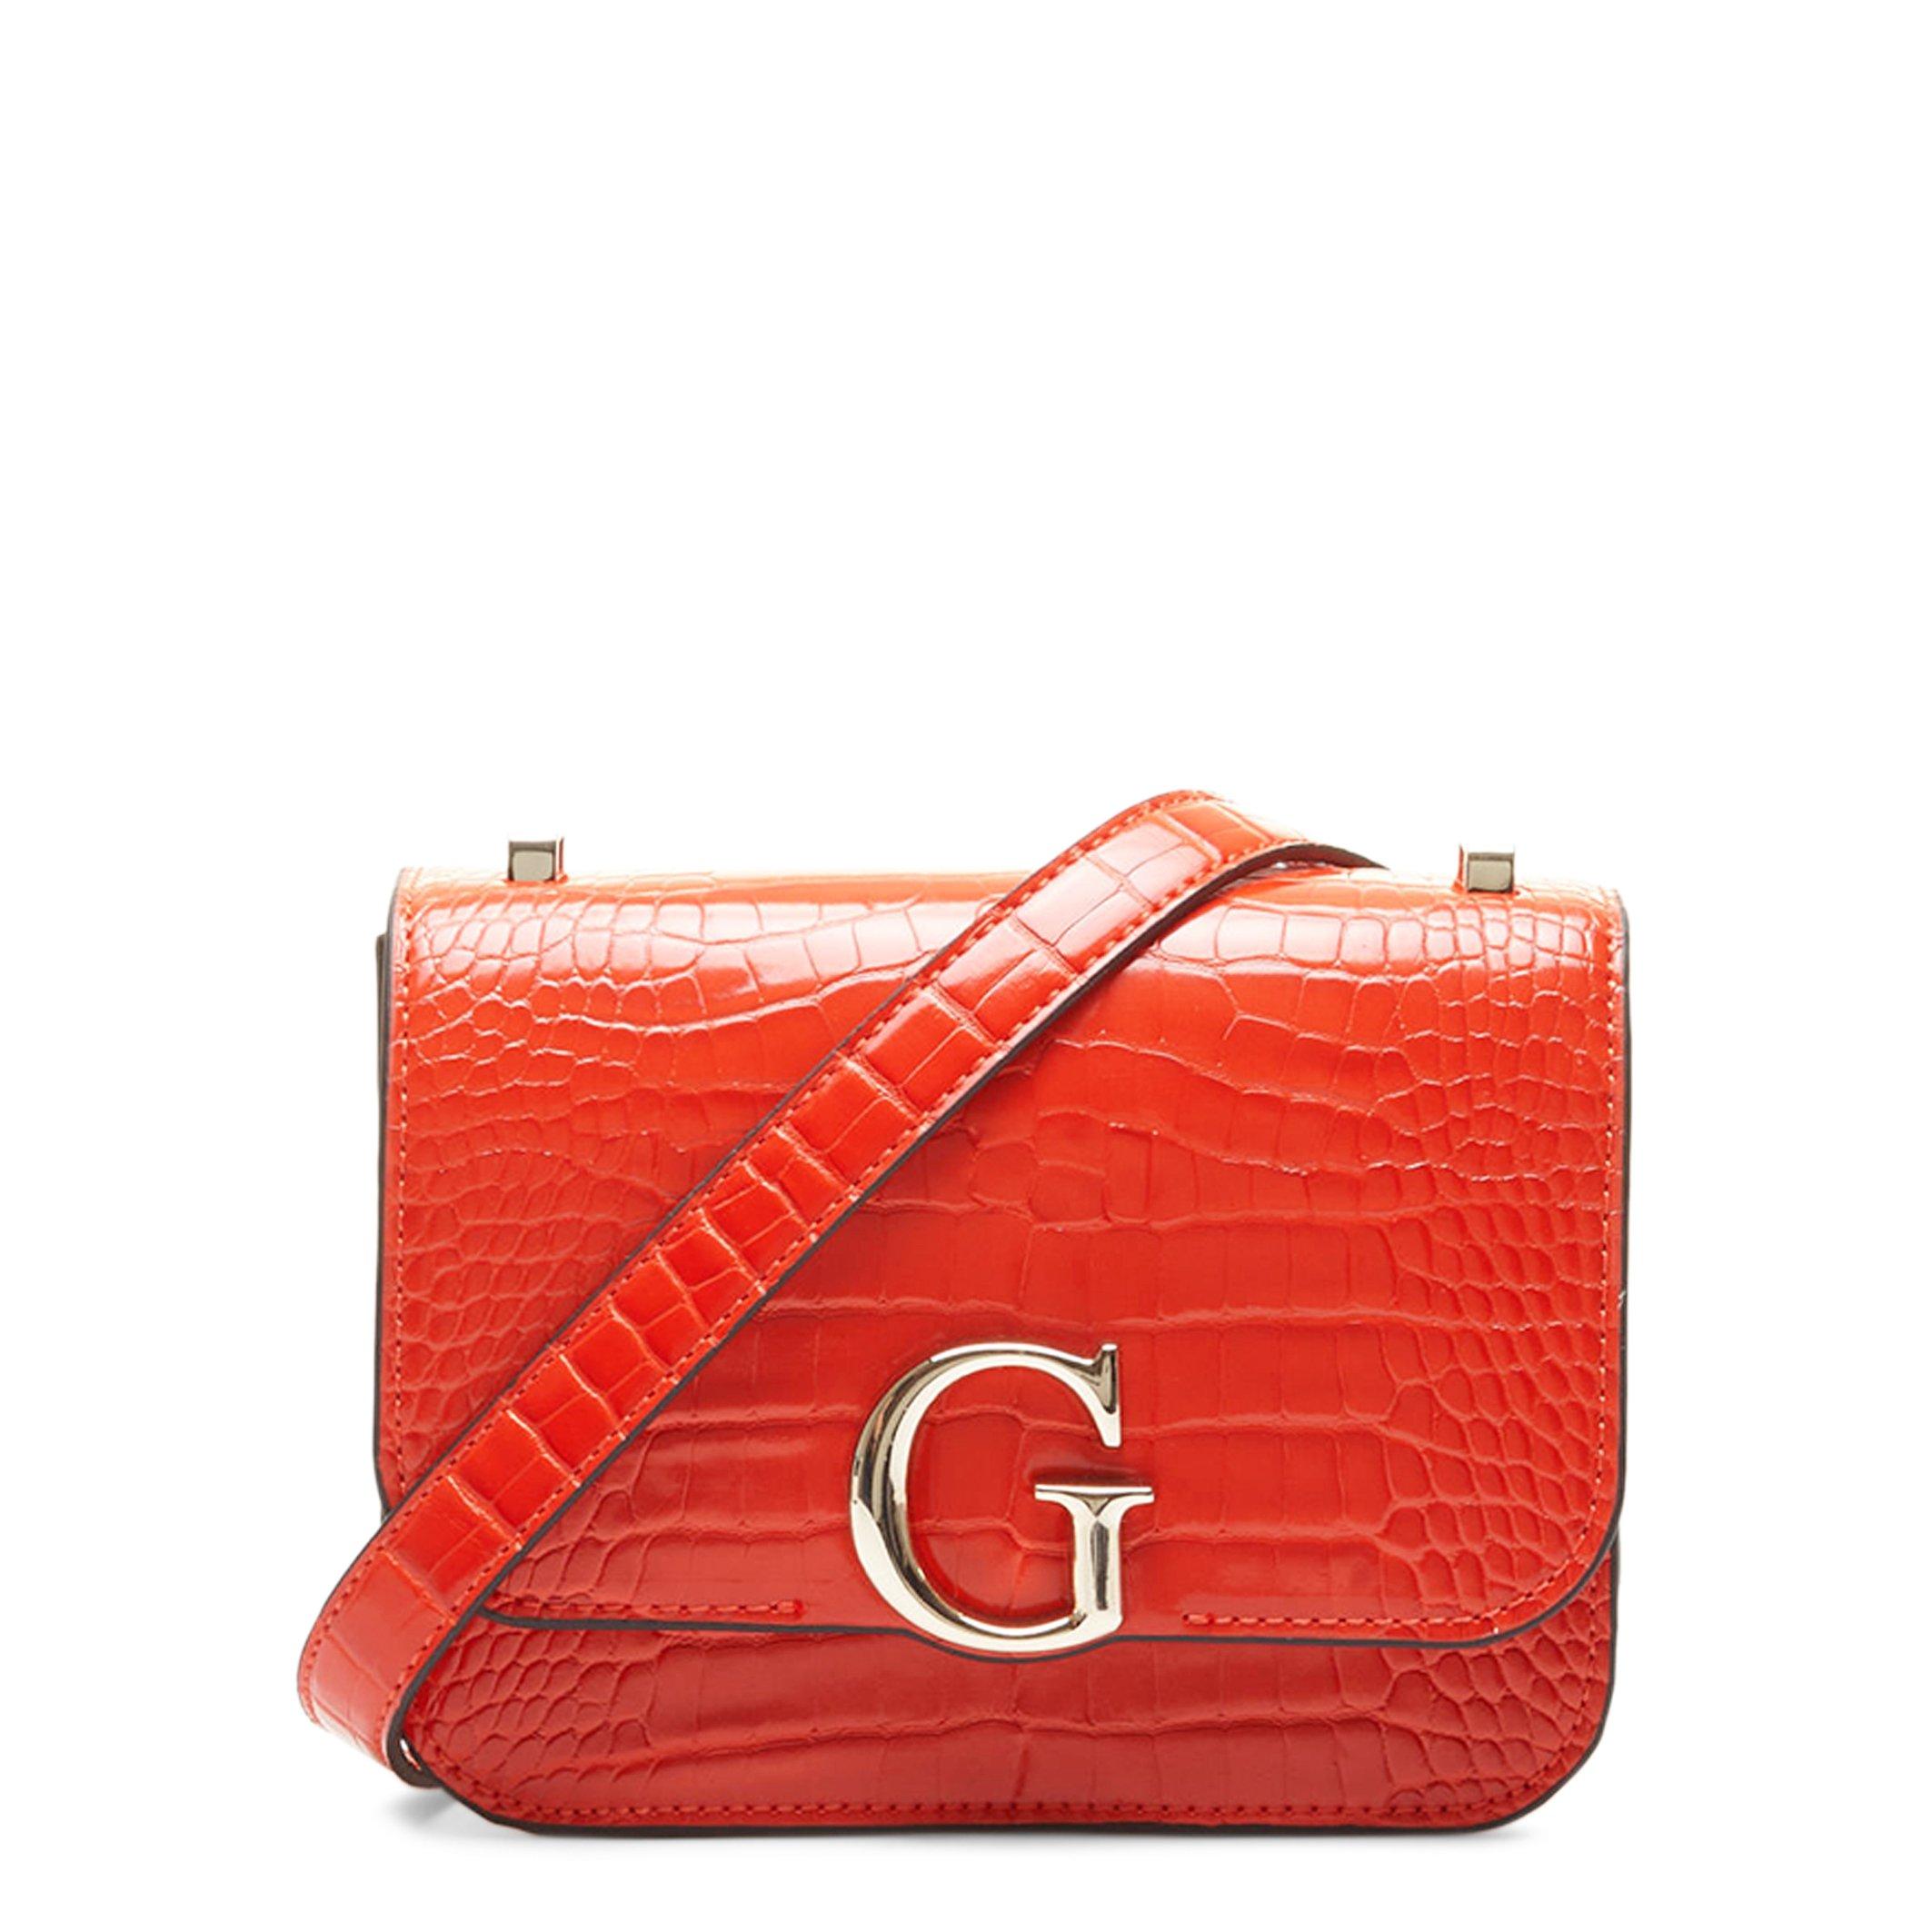 Guess Women's Crossbody Bag Various Colours Corily_HWCG79_91780 - orange NOSIZE